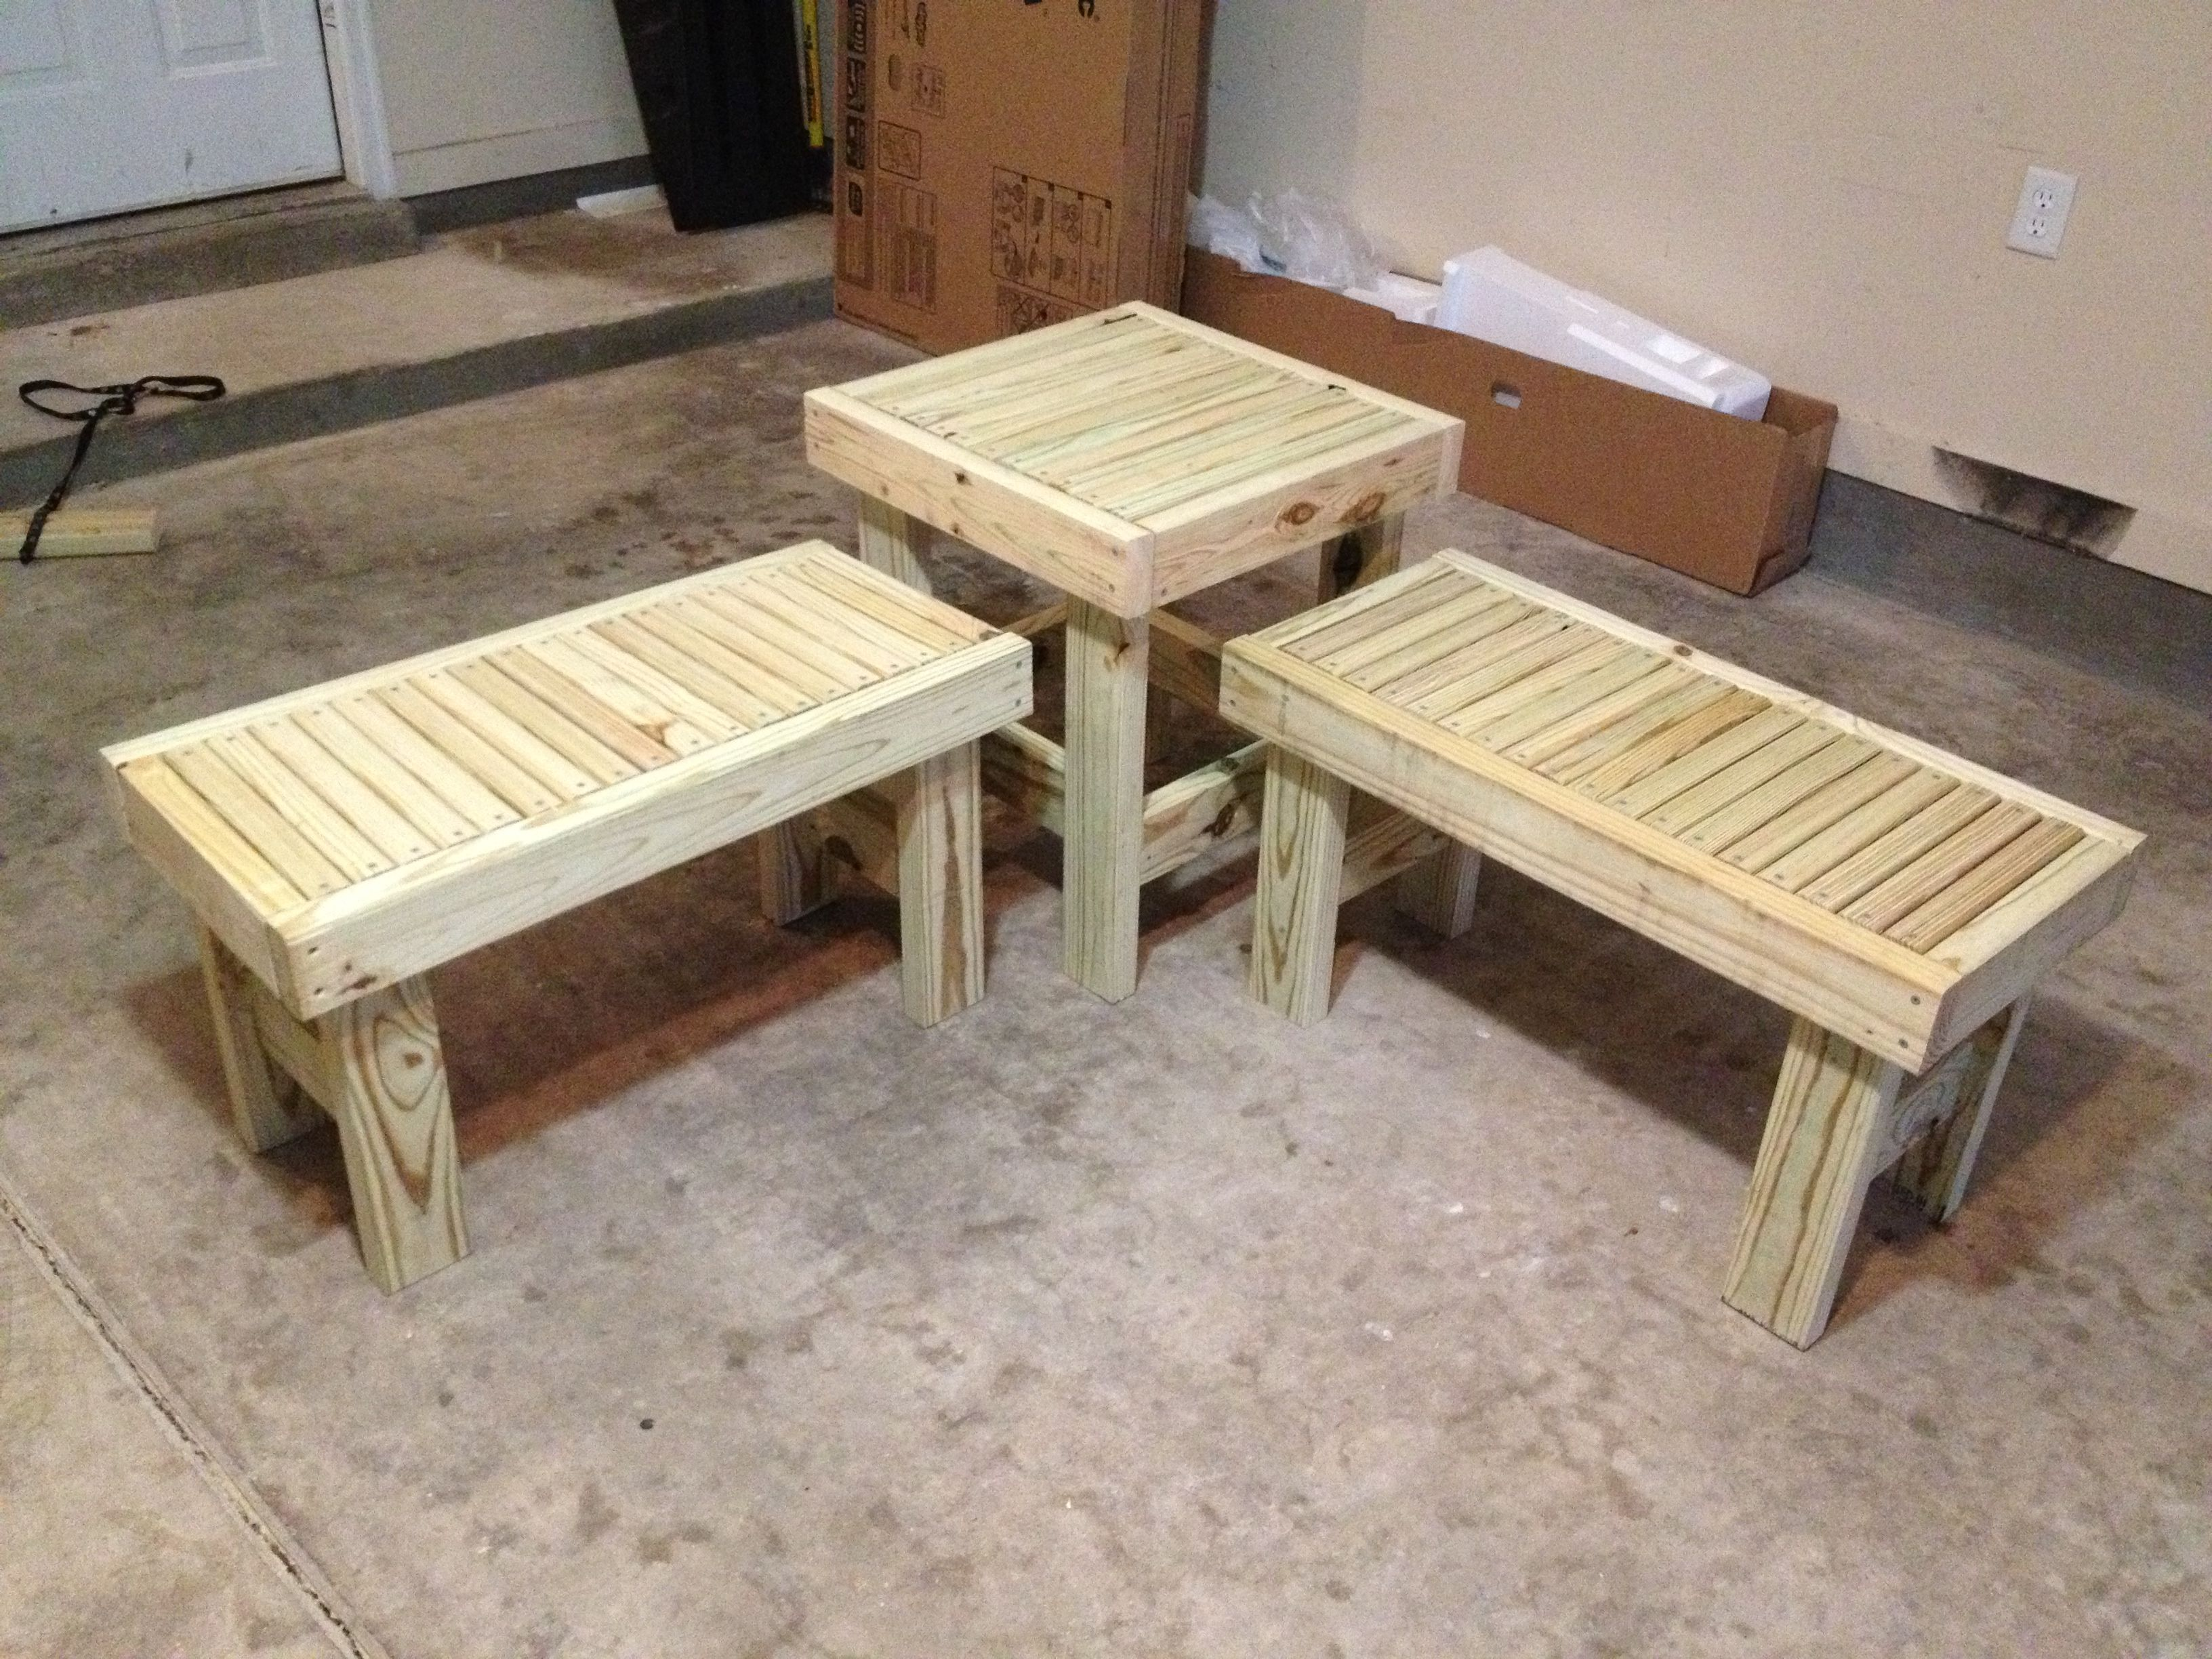 Patio Furniture made easy 2x4 DIY Furniture Designs